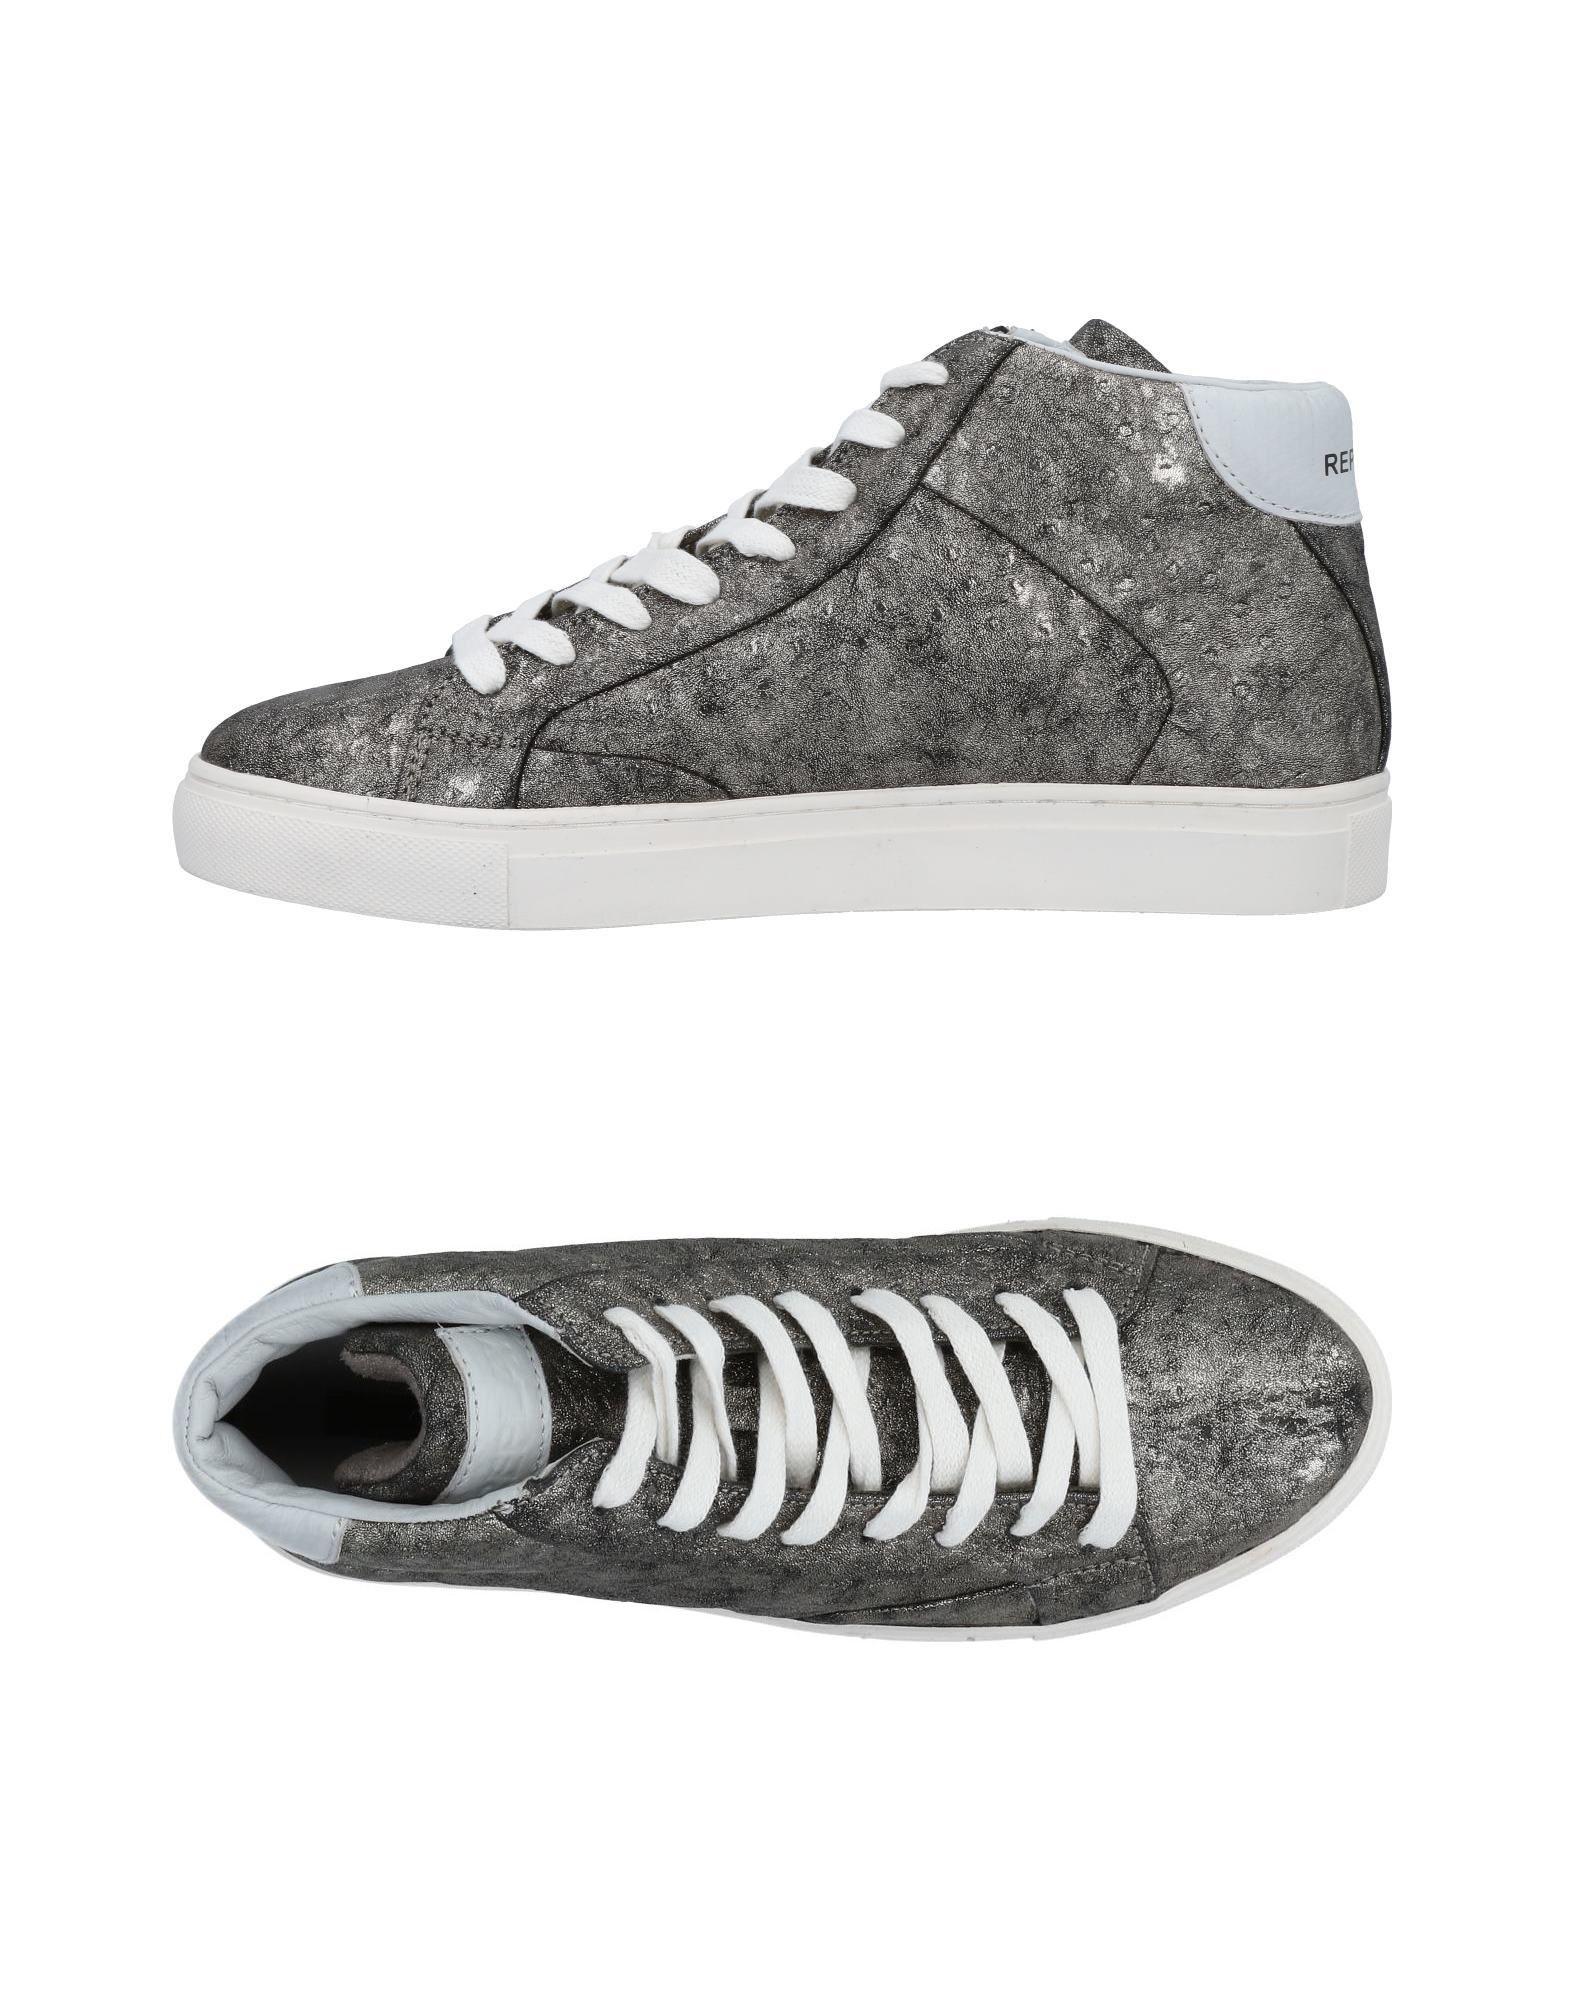 Moda Sneakers Replay Donna - 11493451BK